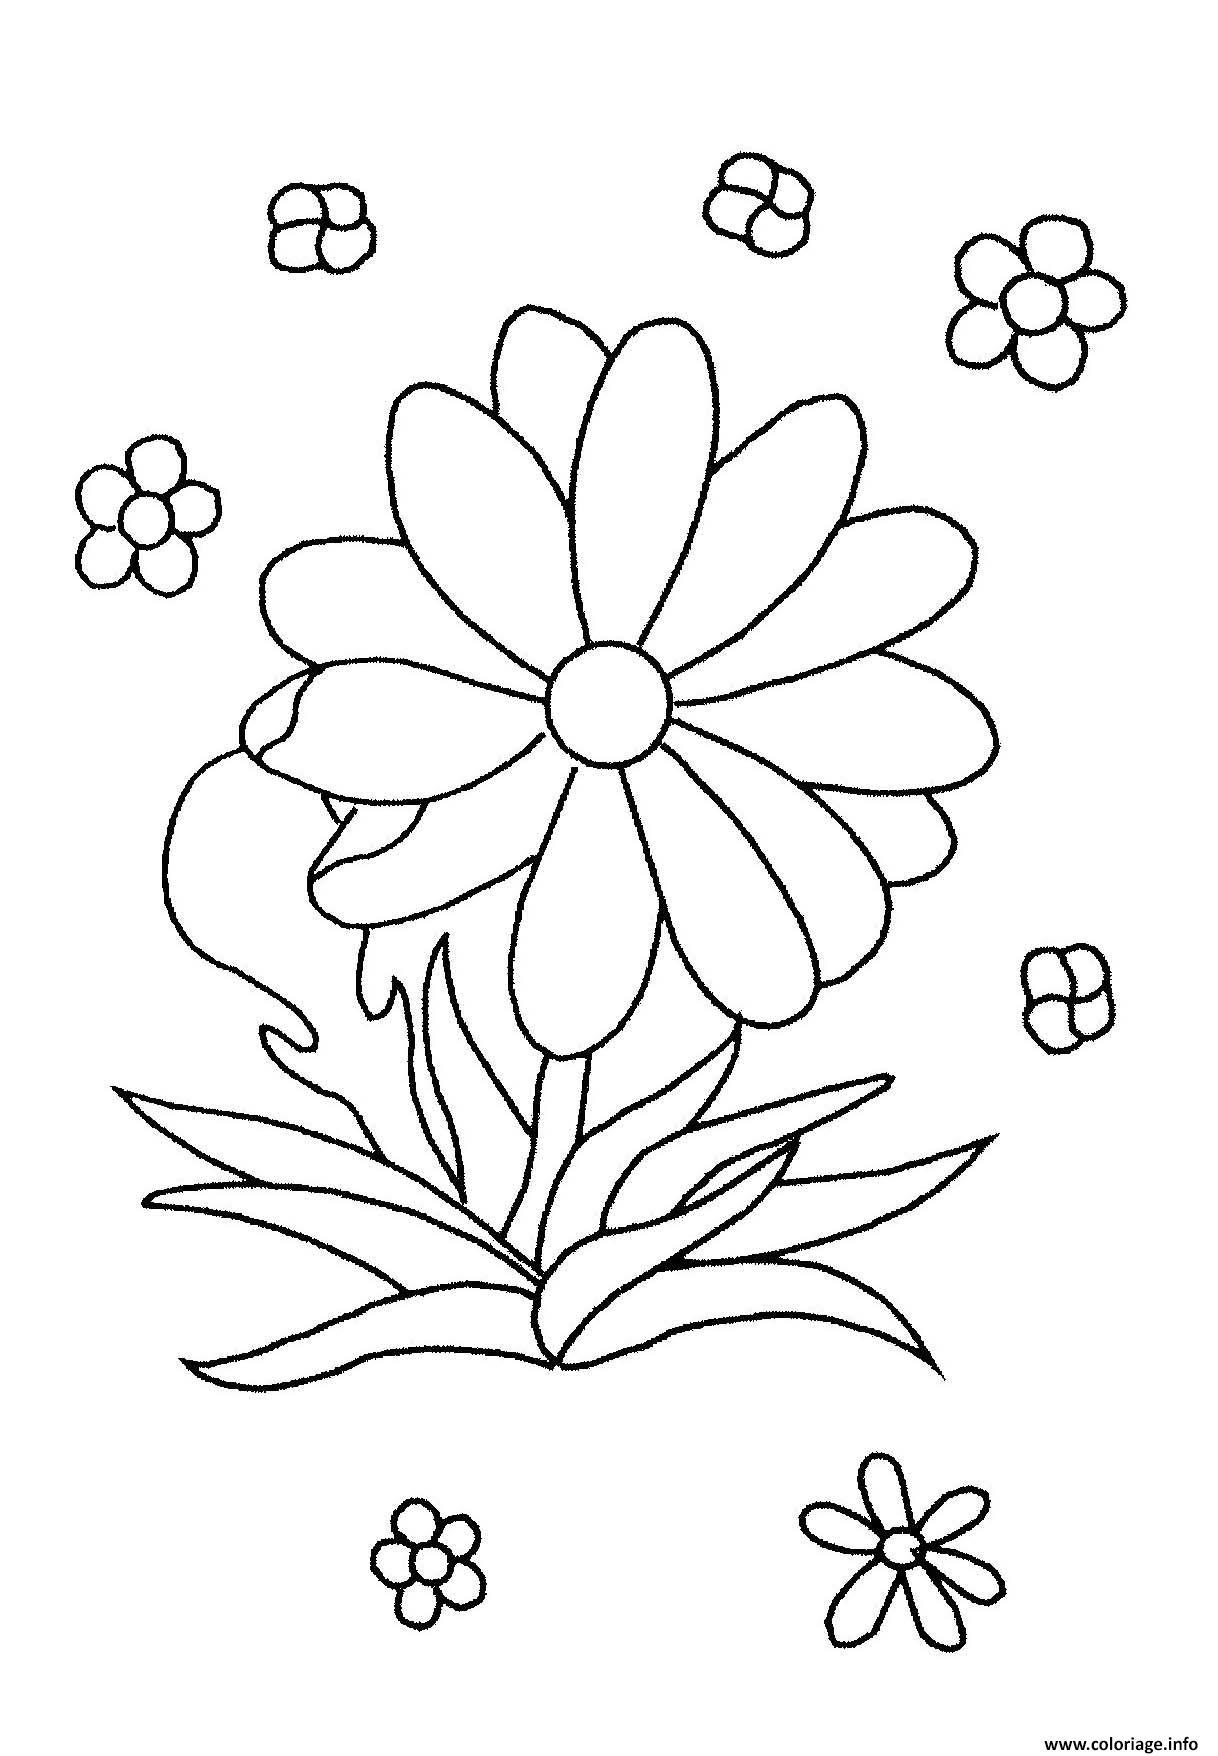 Coloriage Fleur Simple Facile Maternelle Dessin